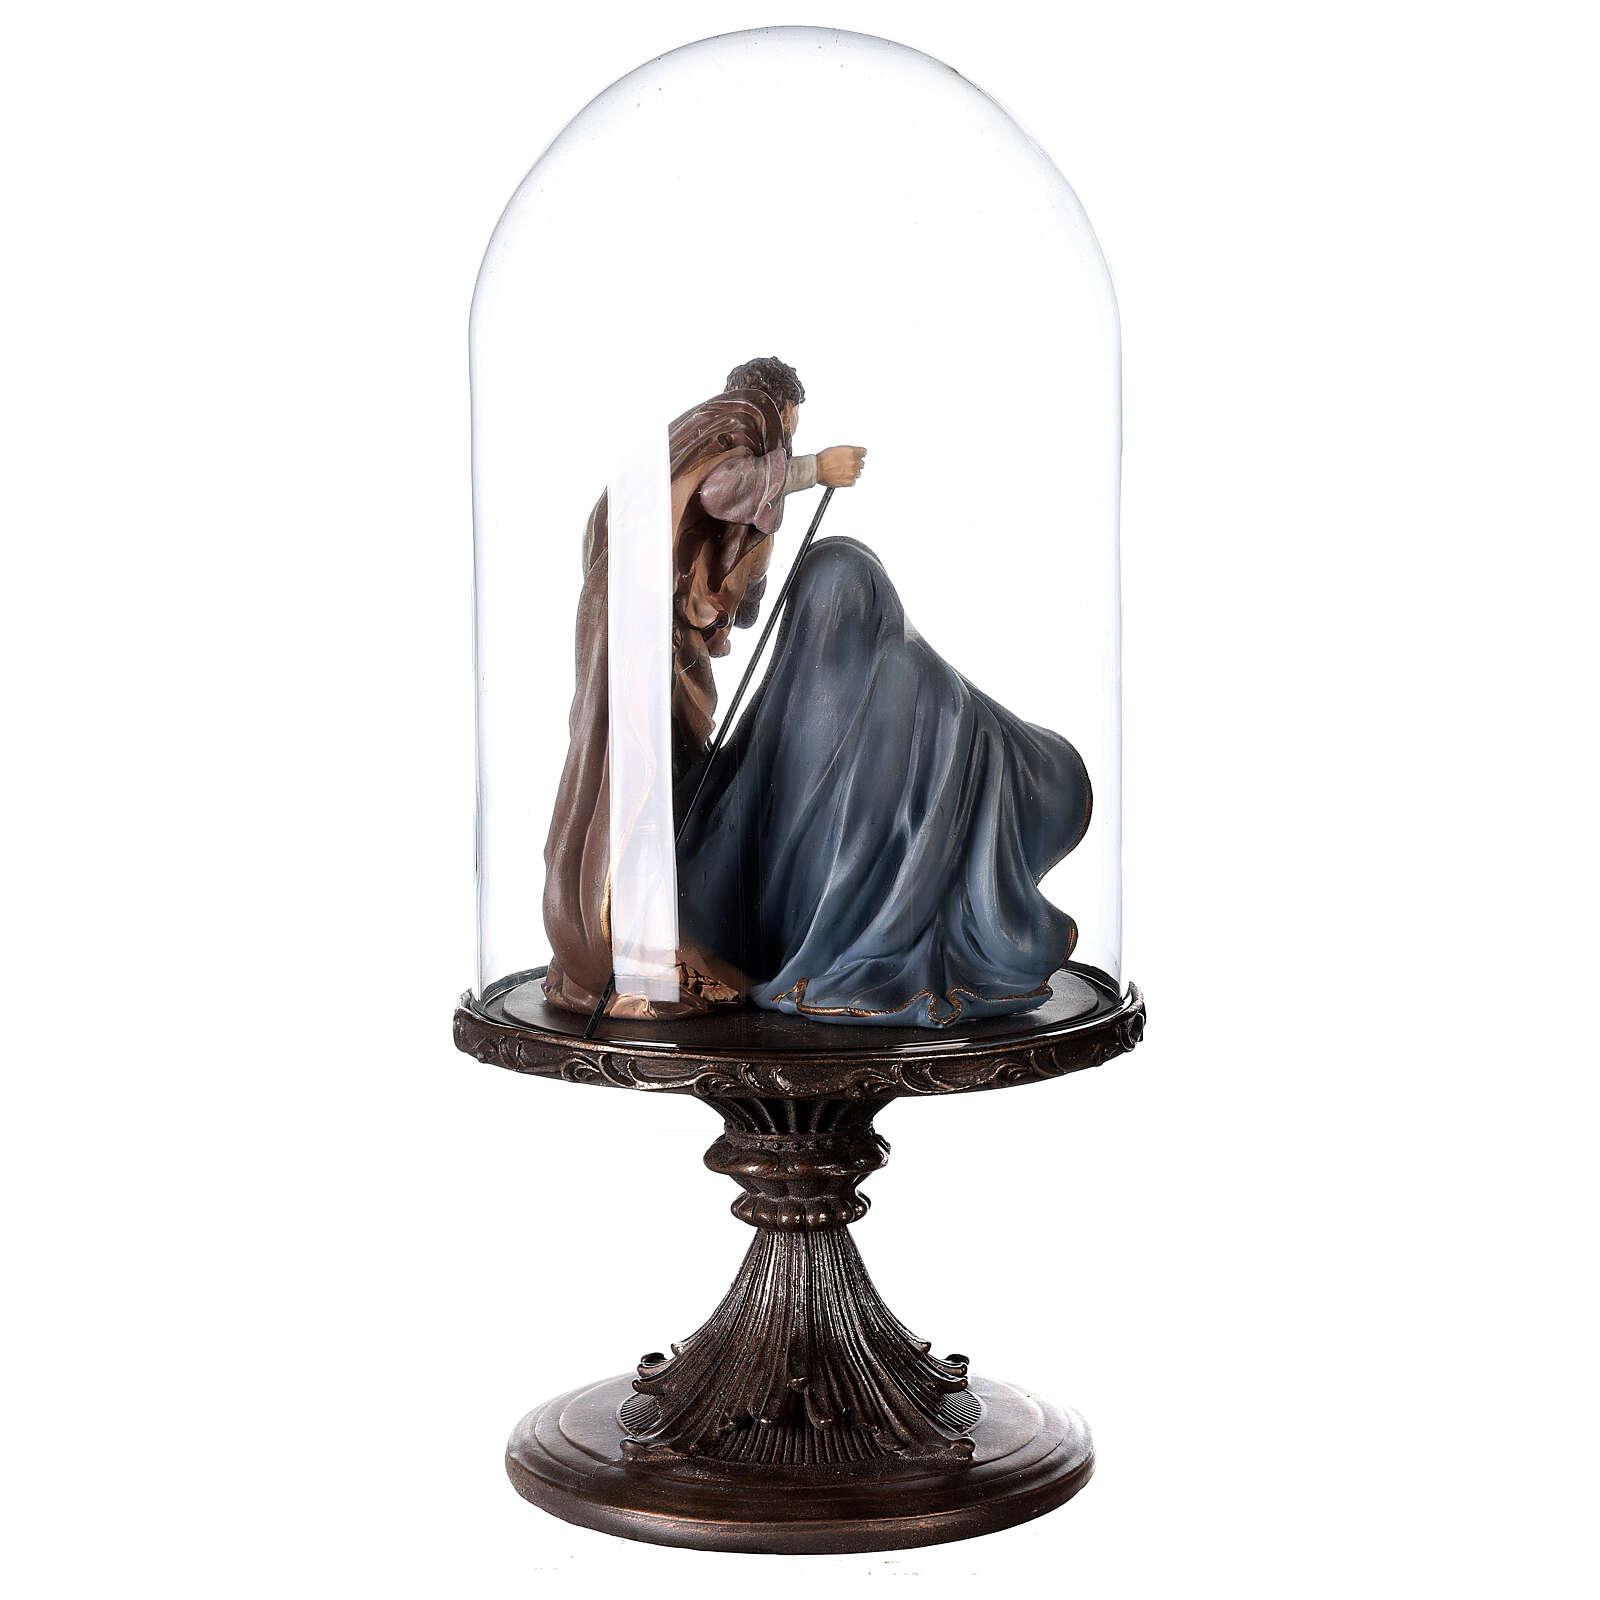 Natività resina 20 cm in campana di vetro 45 cm 3